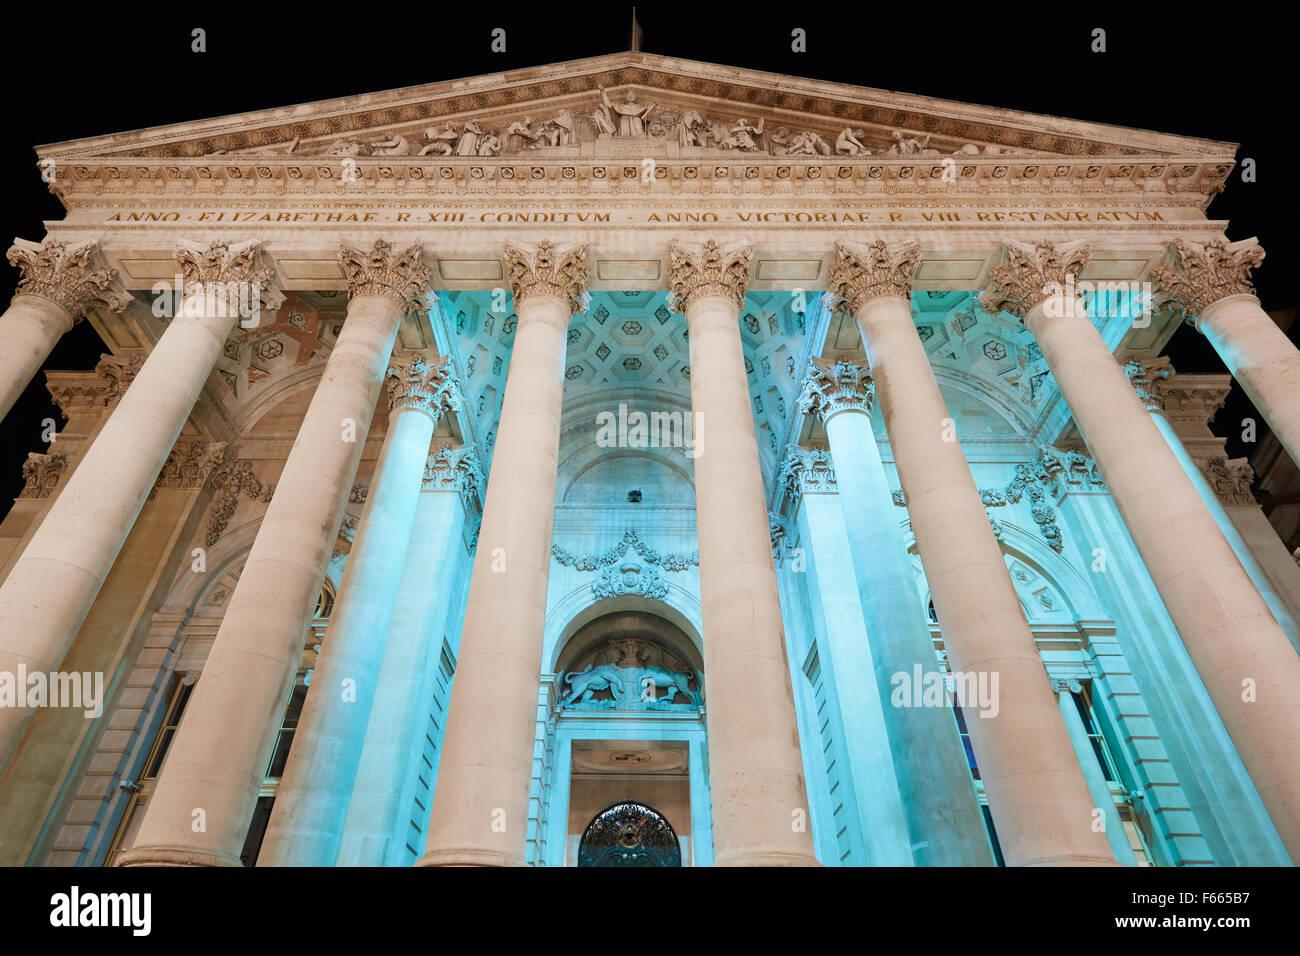 London Royal Exchange, luxury shopping Center facade at night - Stock Image